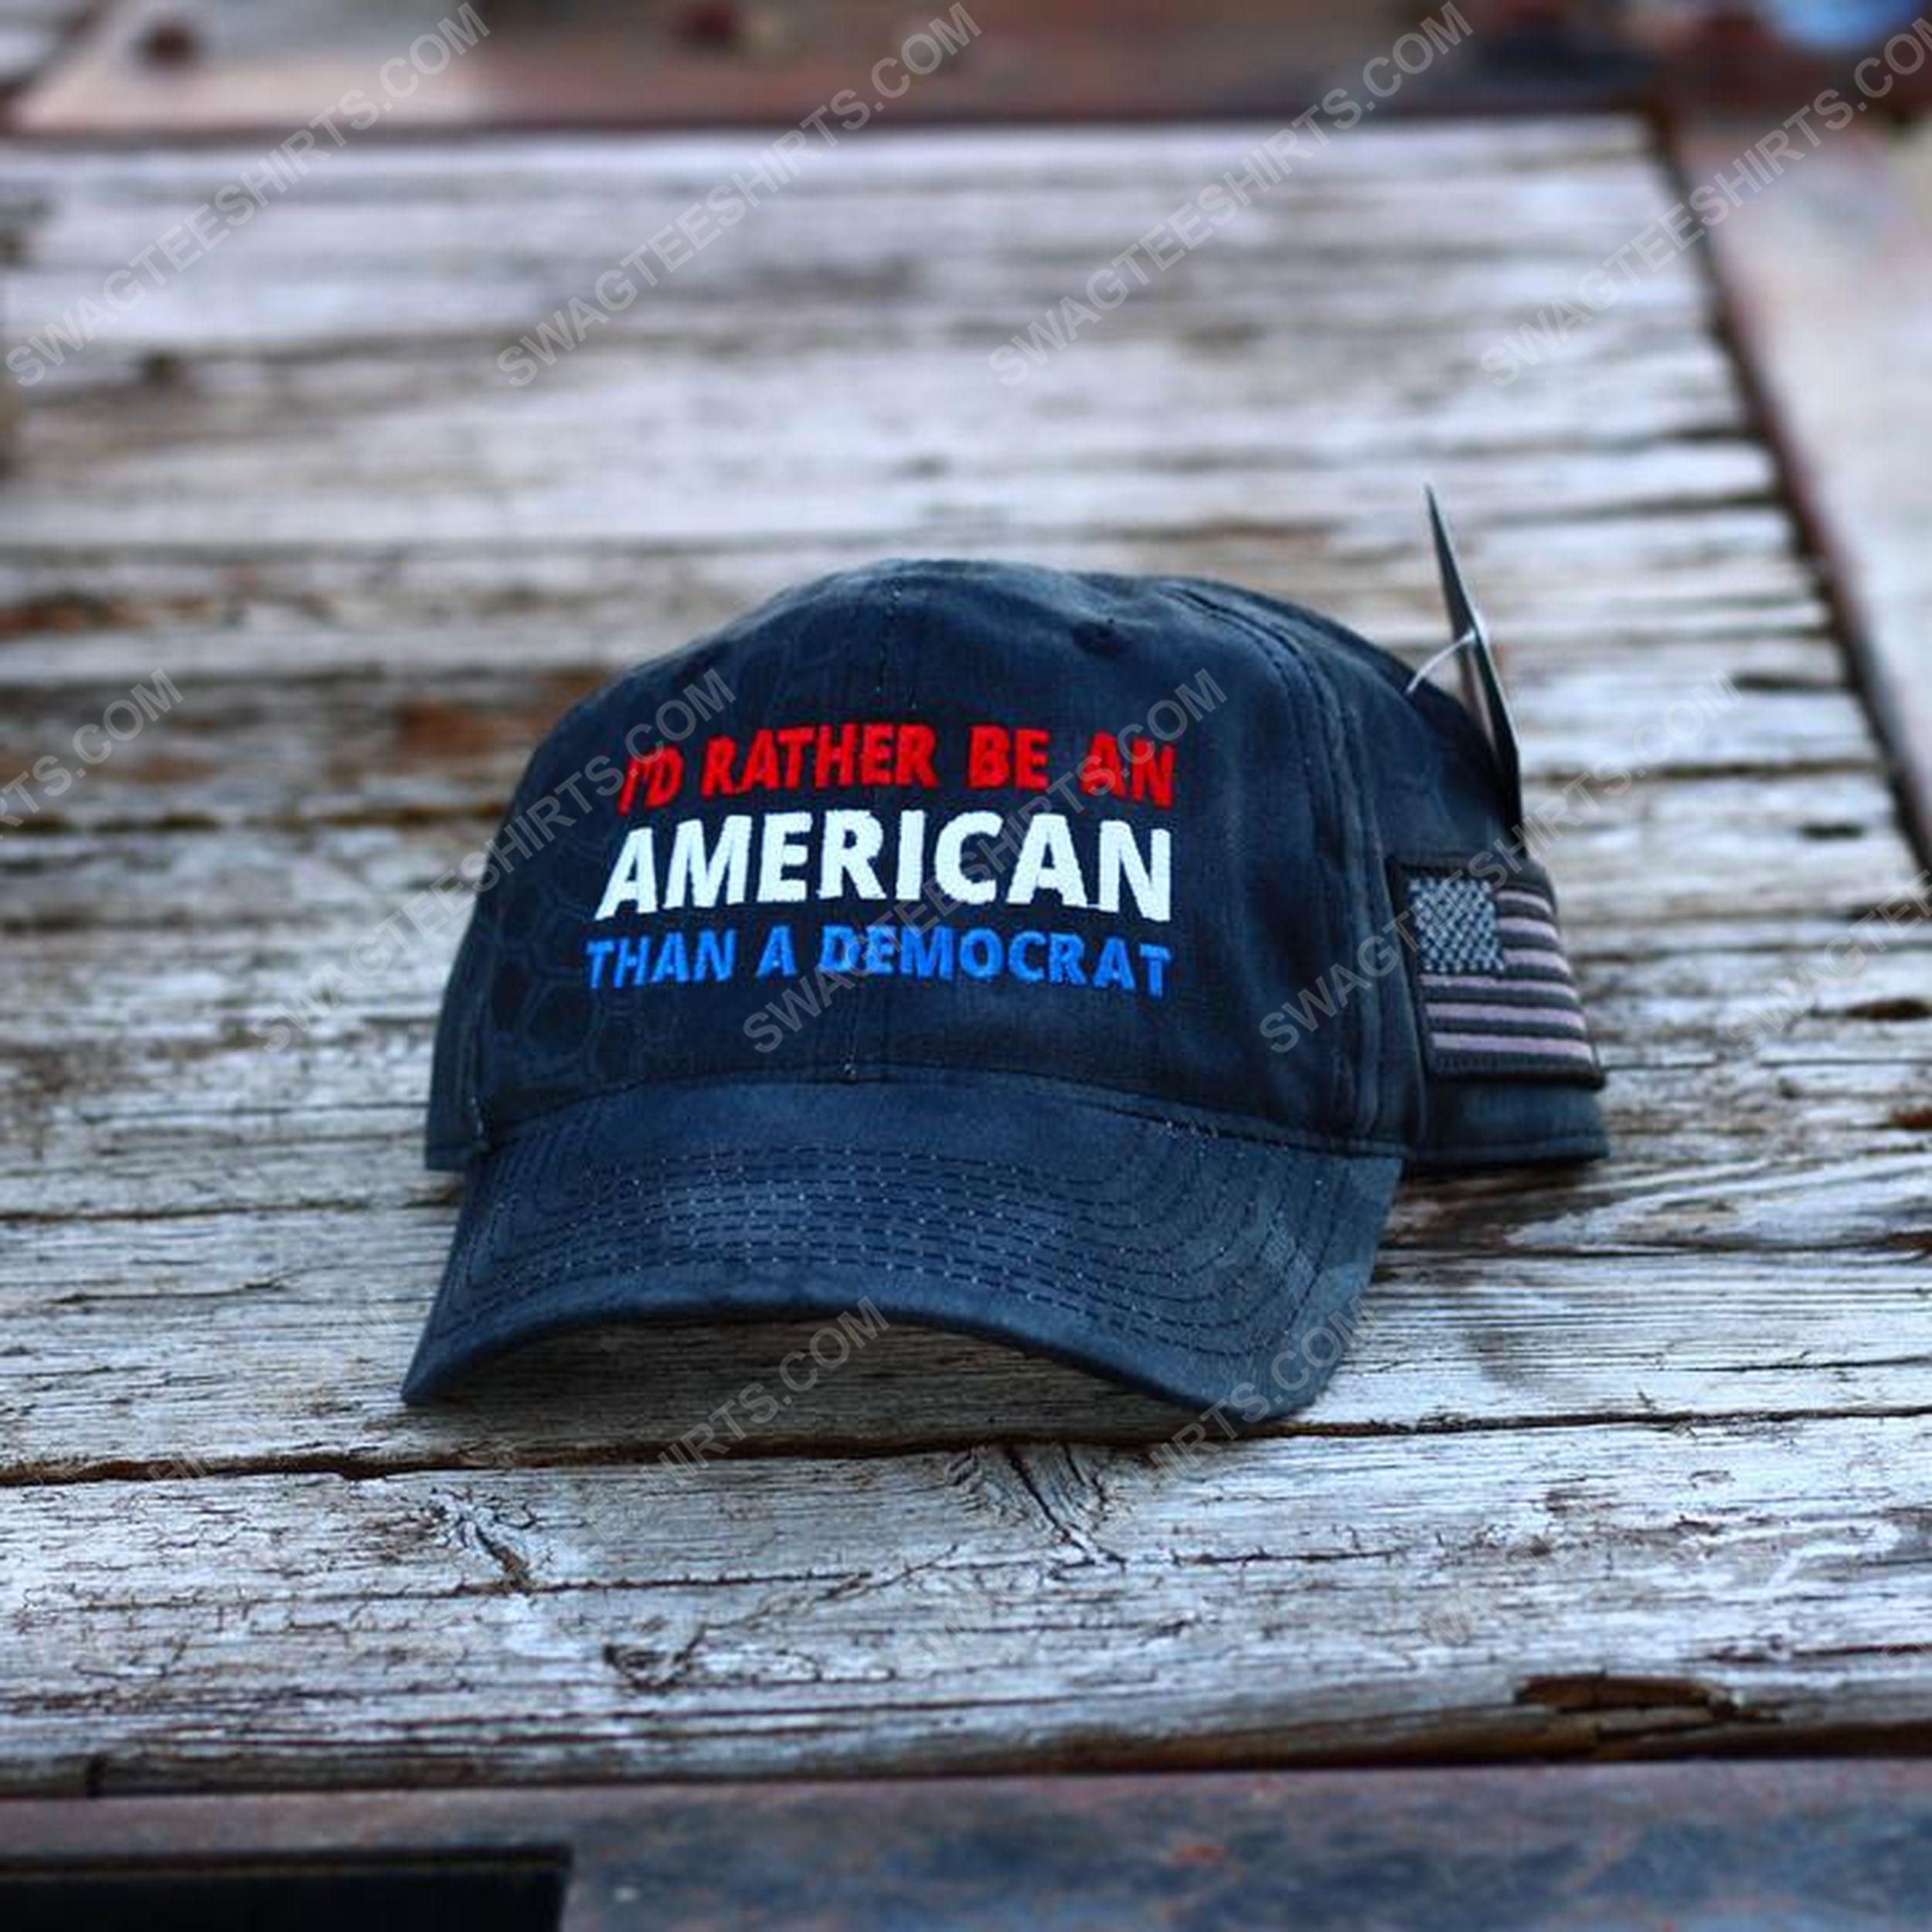 I'd rather be an american than a democrat full print classic hat 1 - Copy